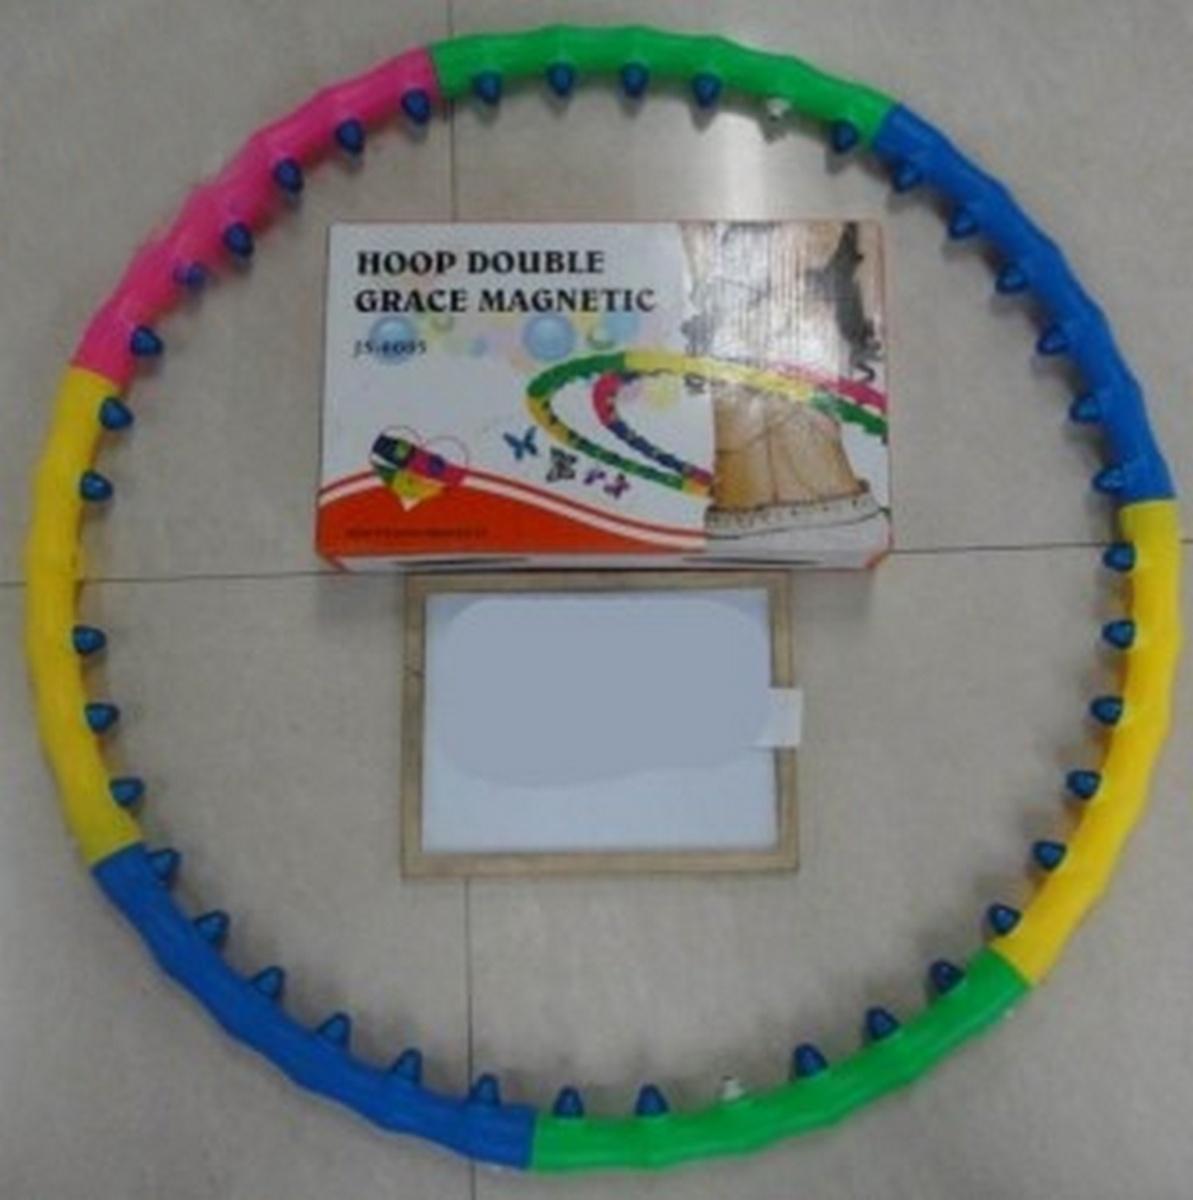 bk toys ltd. Обруч хула хуп 90 см BT-HH-0003